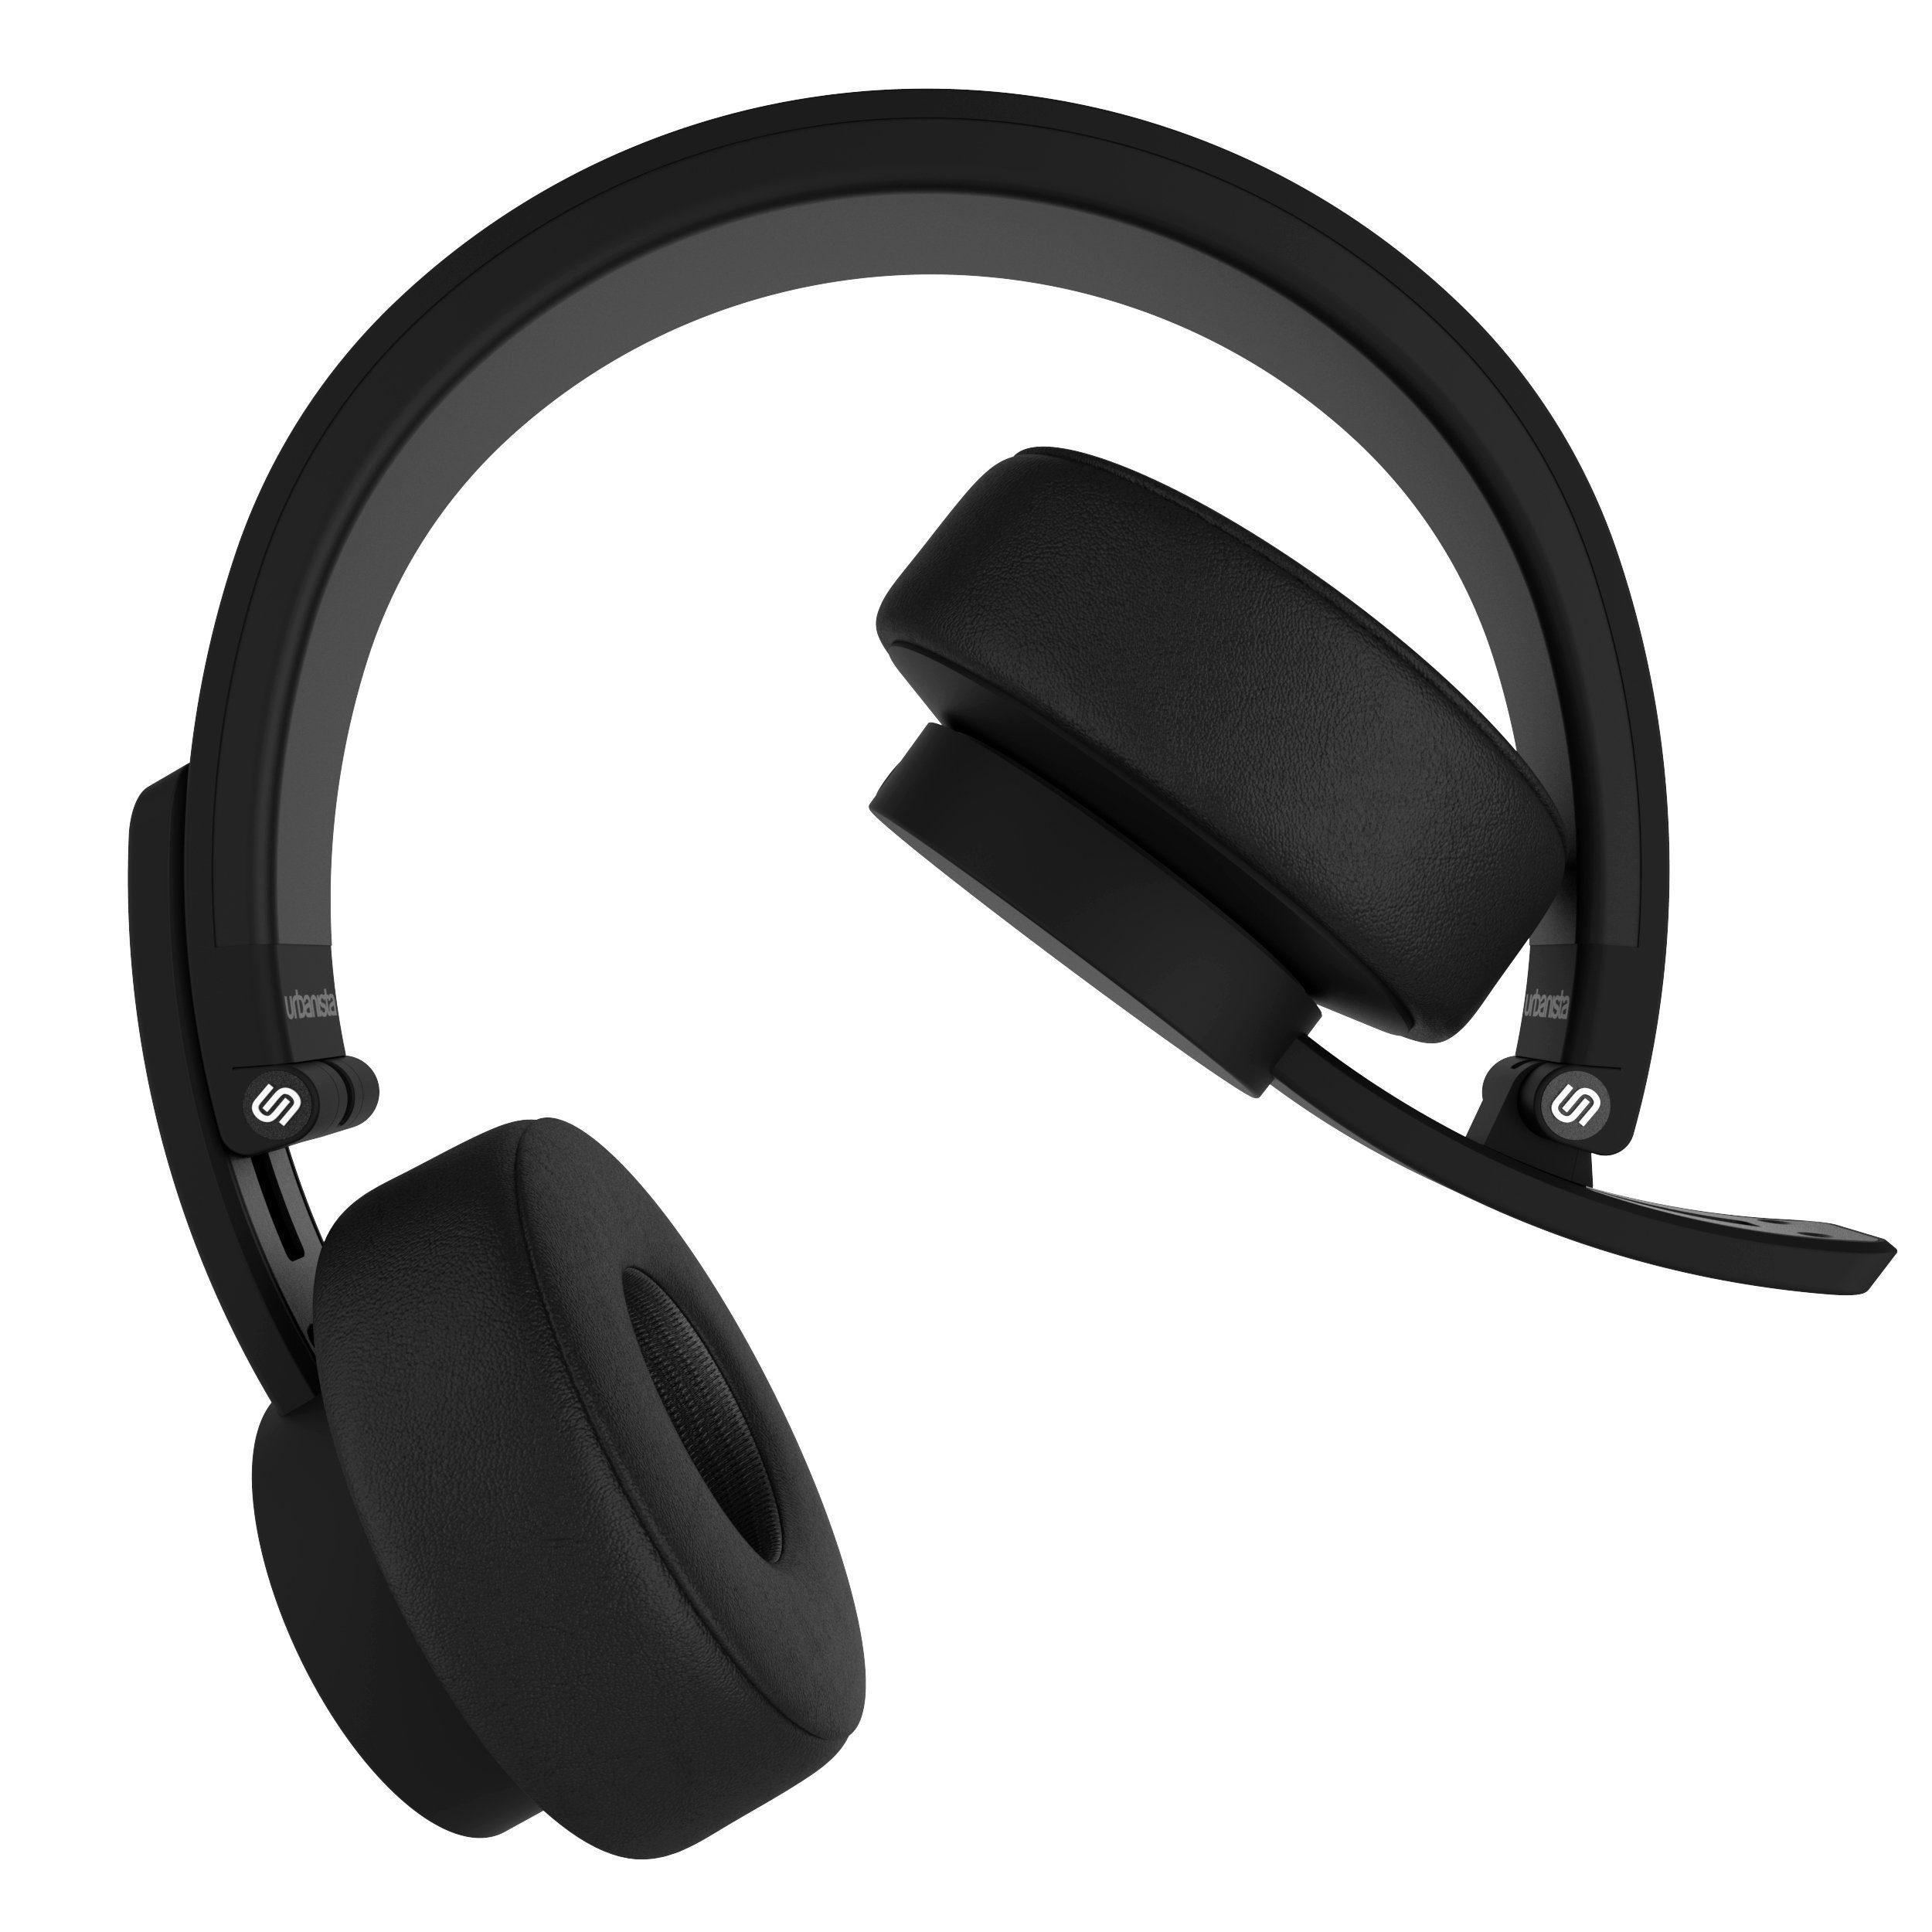 Urbanista On-Ear Kopfhörer mit Swipe-Technologie